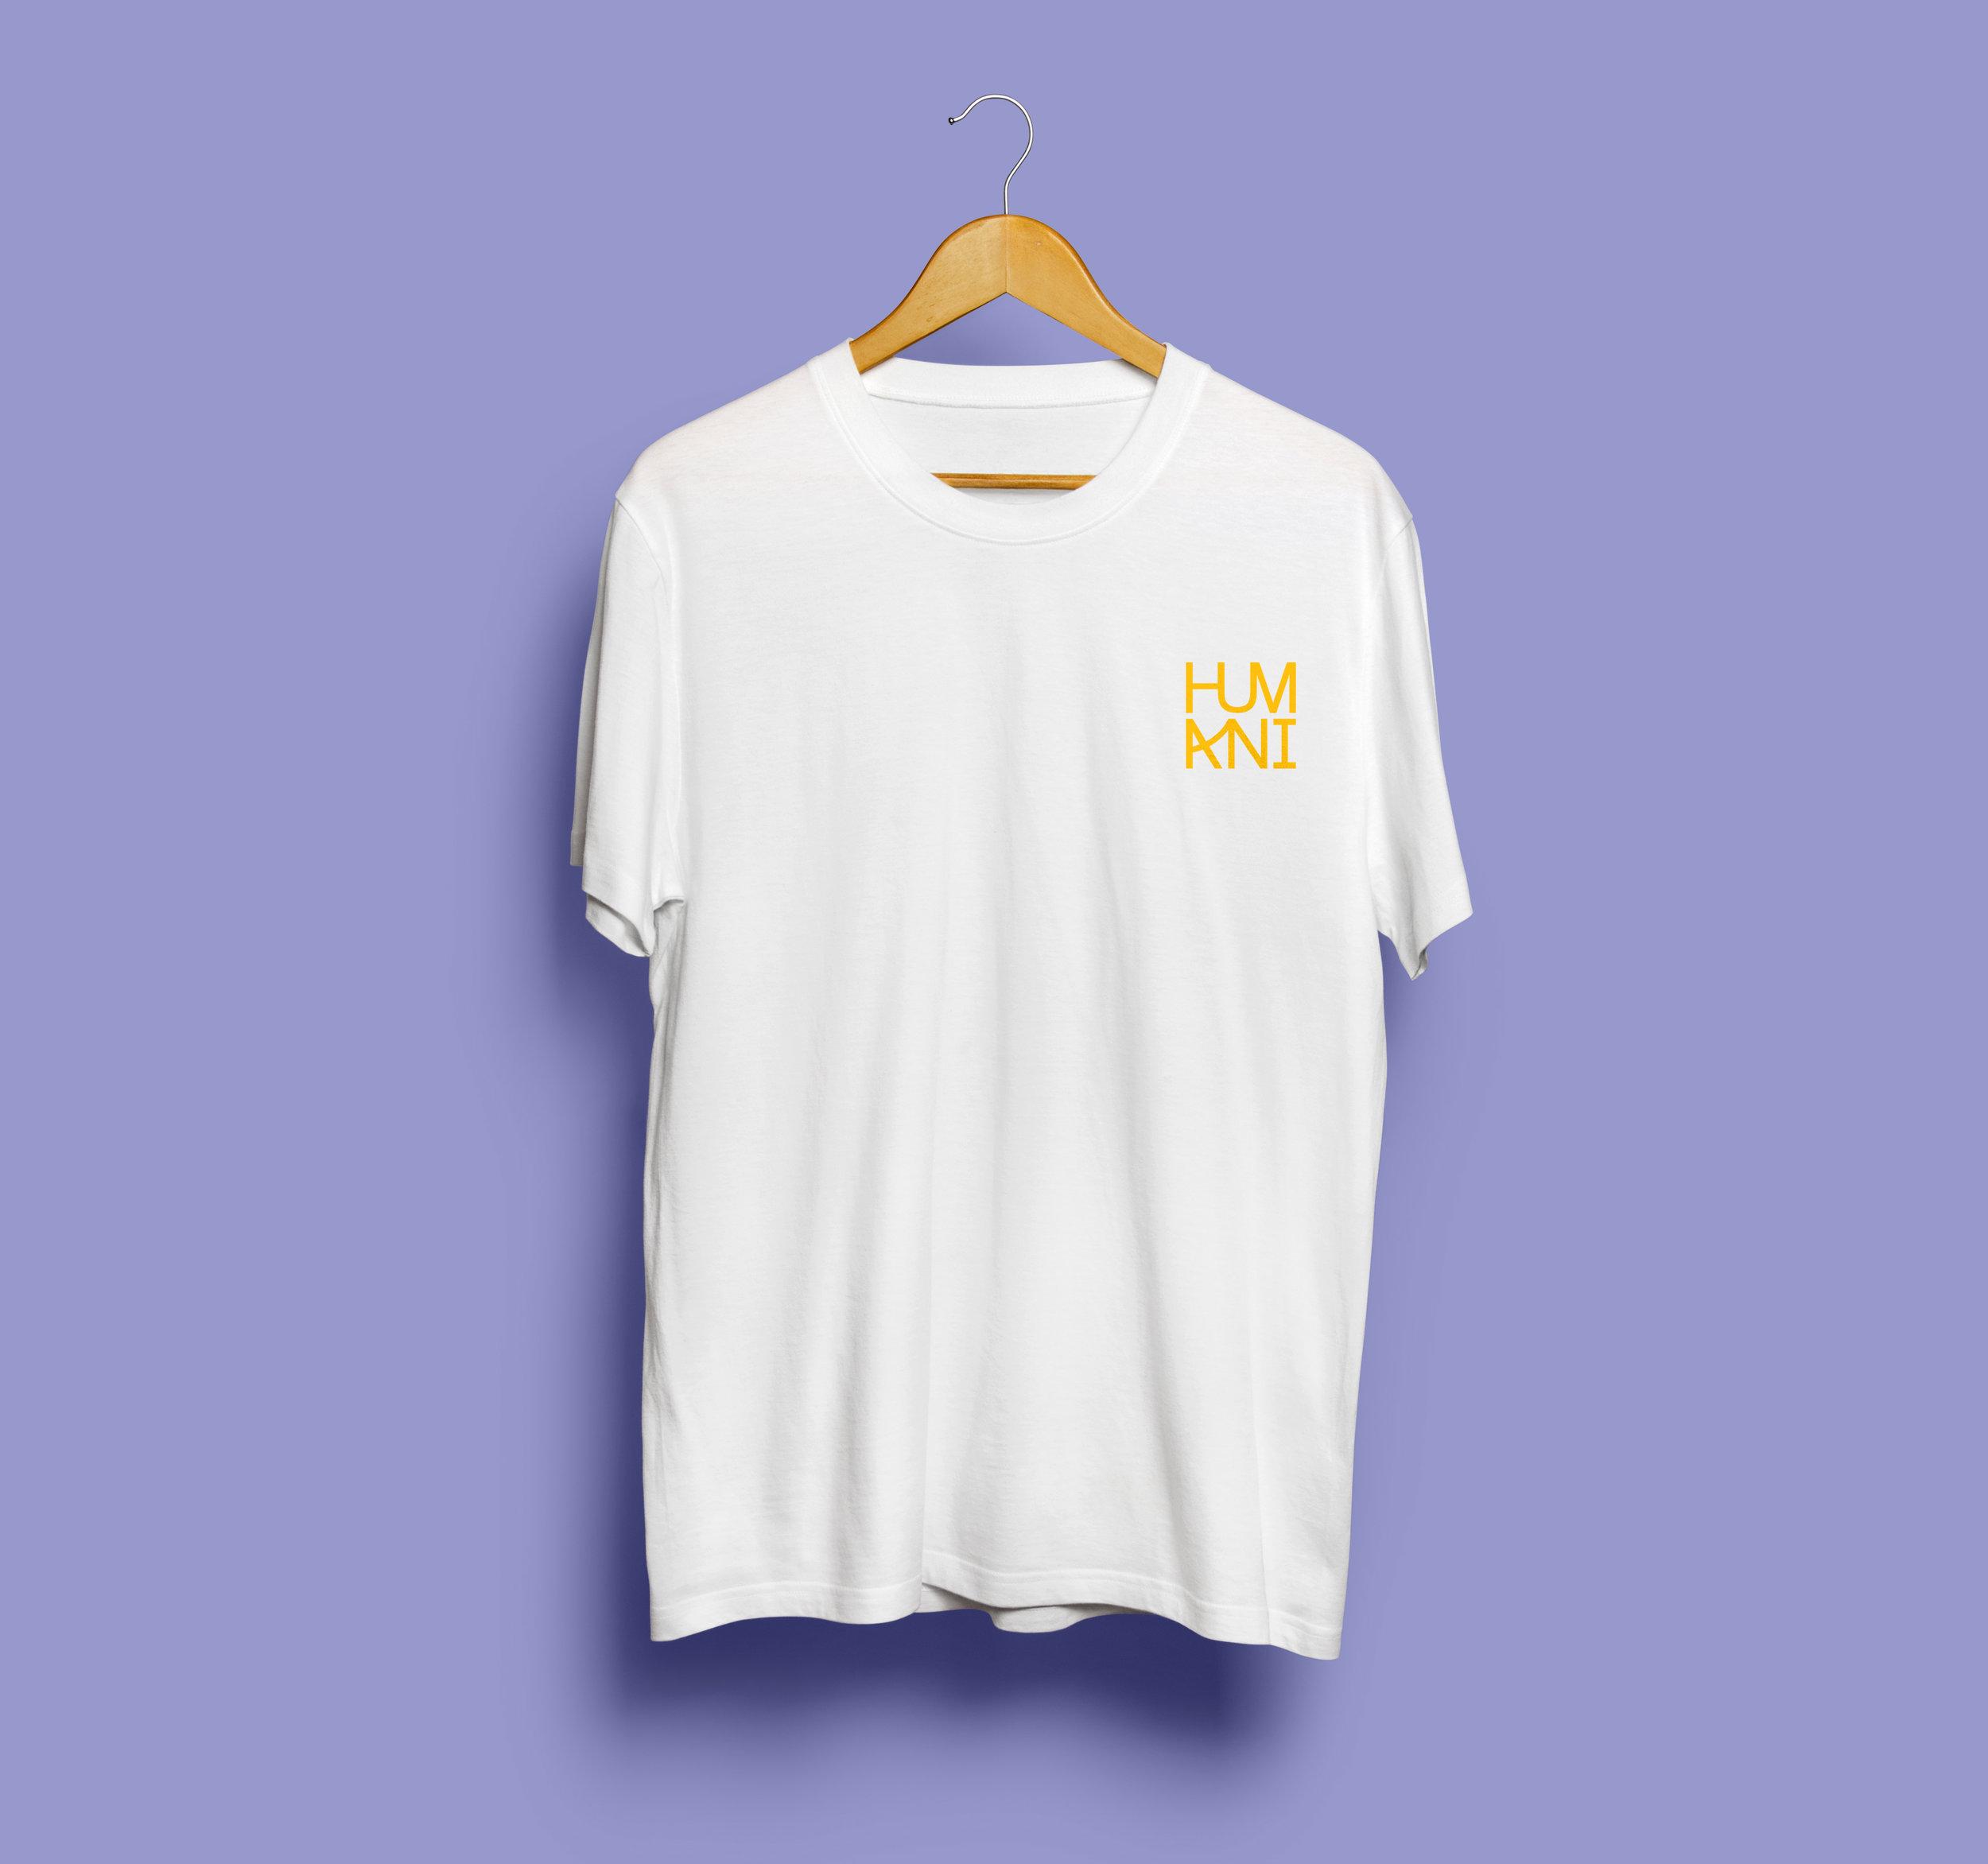 Humani_T-ShirtMock-Up_Front.jpg